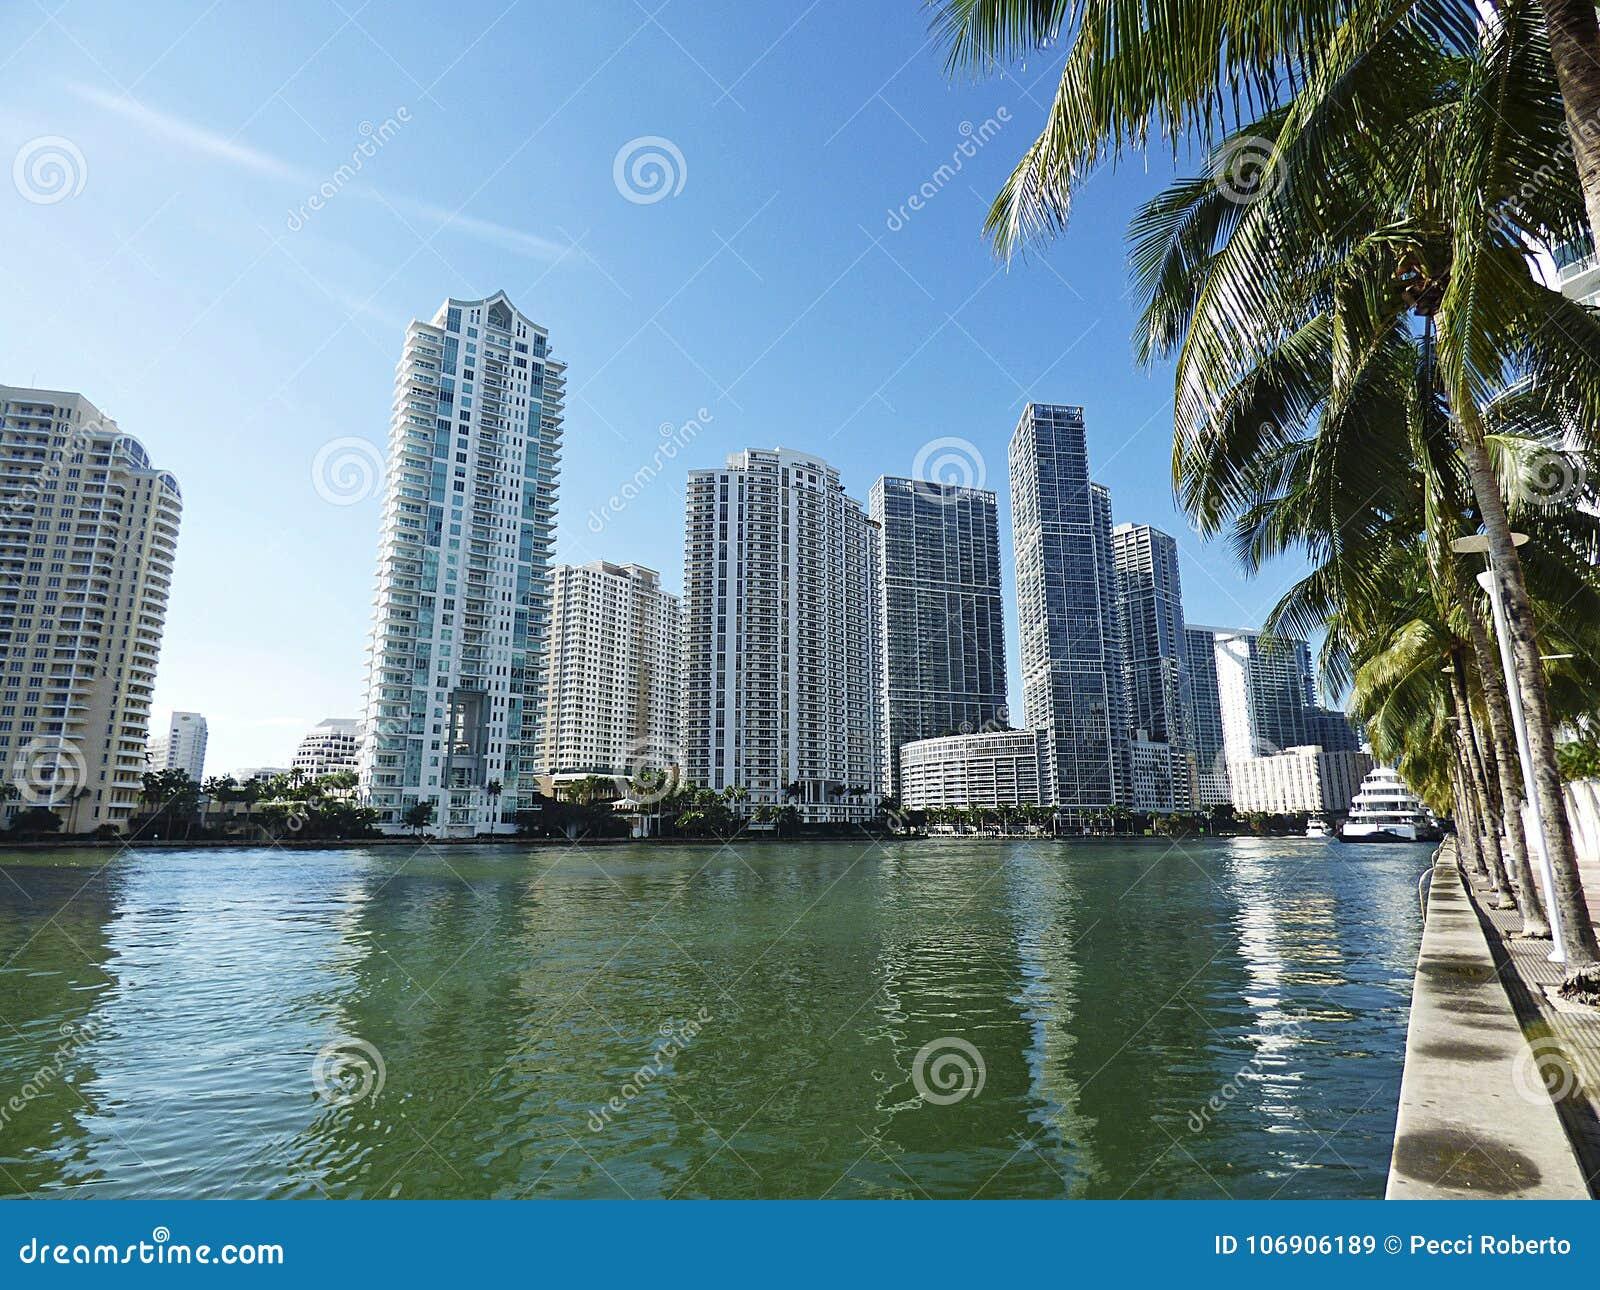 Floryda, Maiami, panoramiczny widok zatoka